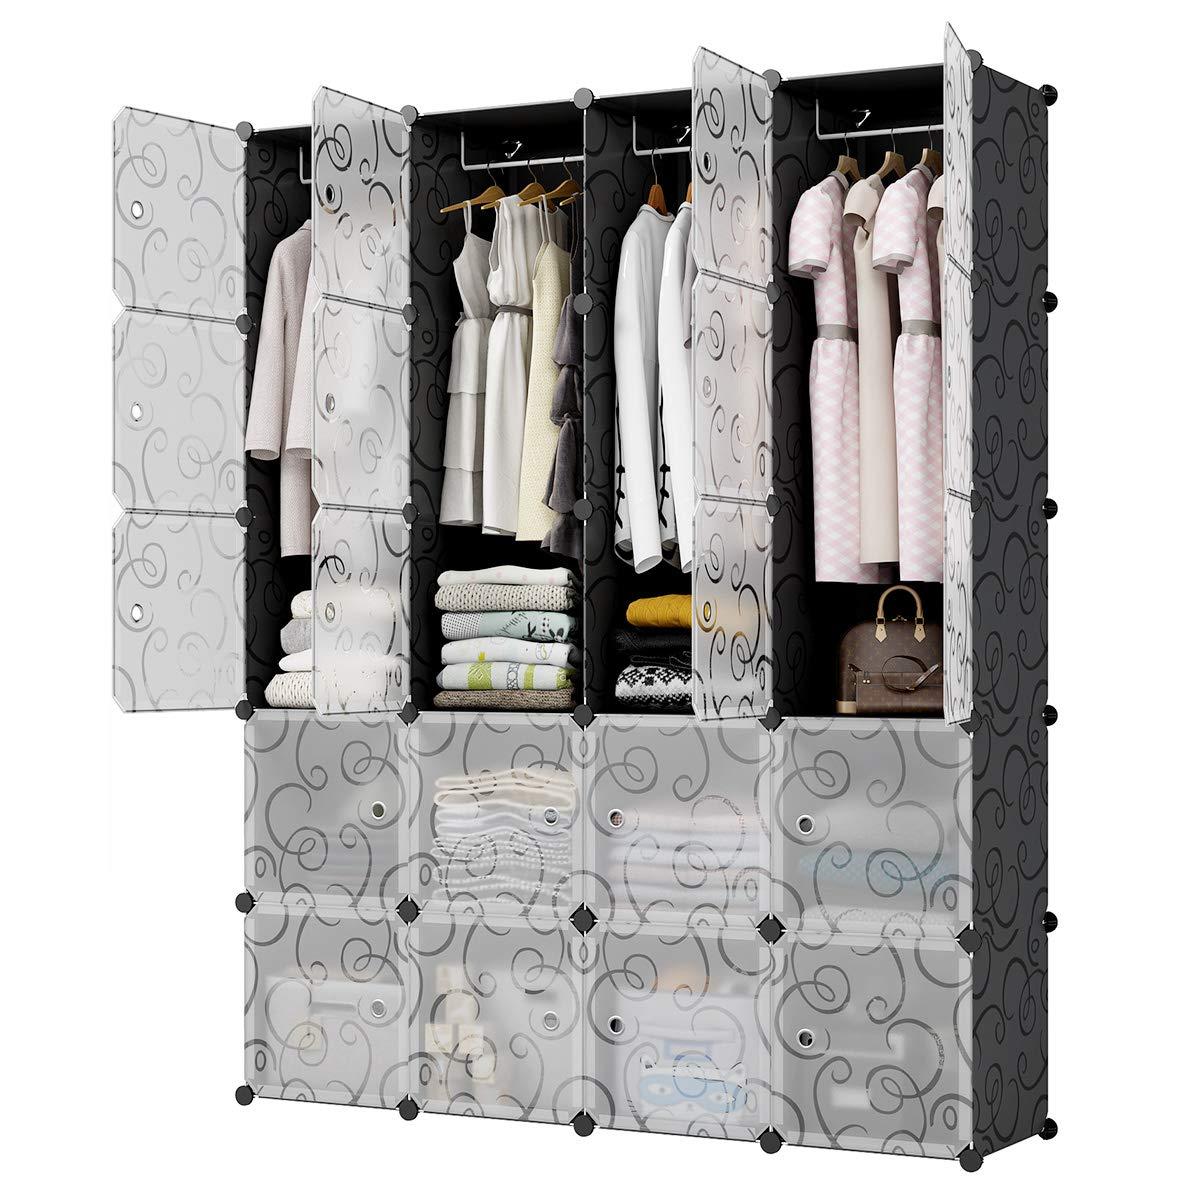 KOUSI Portable Closet Wardrobe Closet Room Closet with Doors Wardrobe with Storage Wardrobes for Bedrooms Portable Closet Wardrobe Bedroom Armoire, Black, 8 Cubes + 4 Hanger